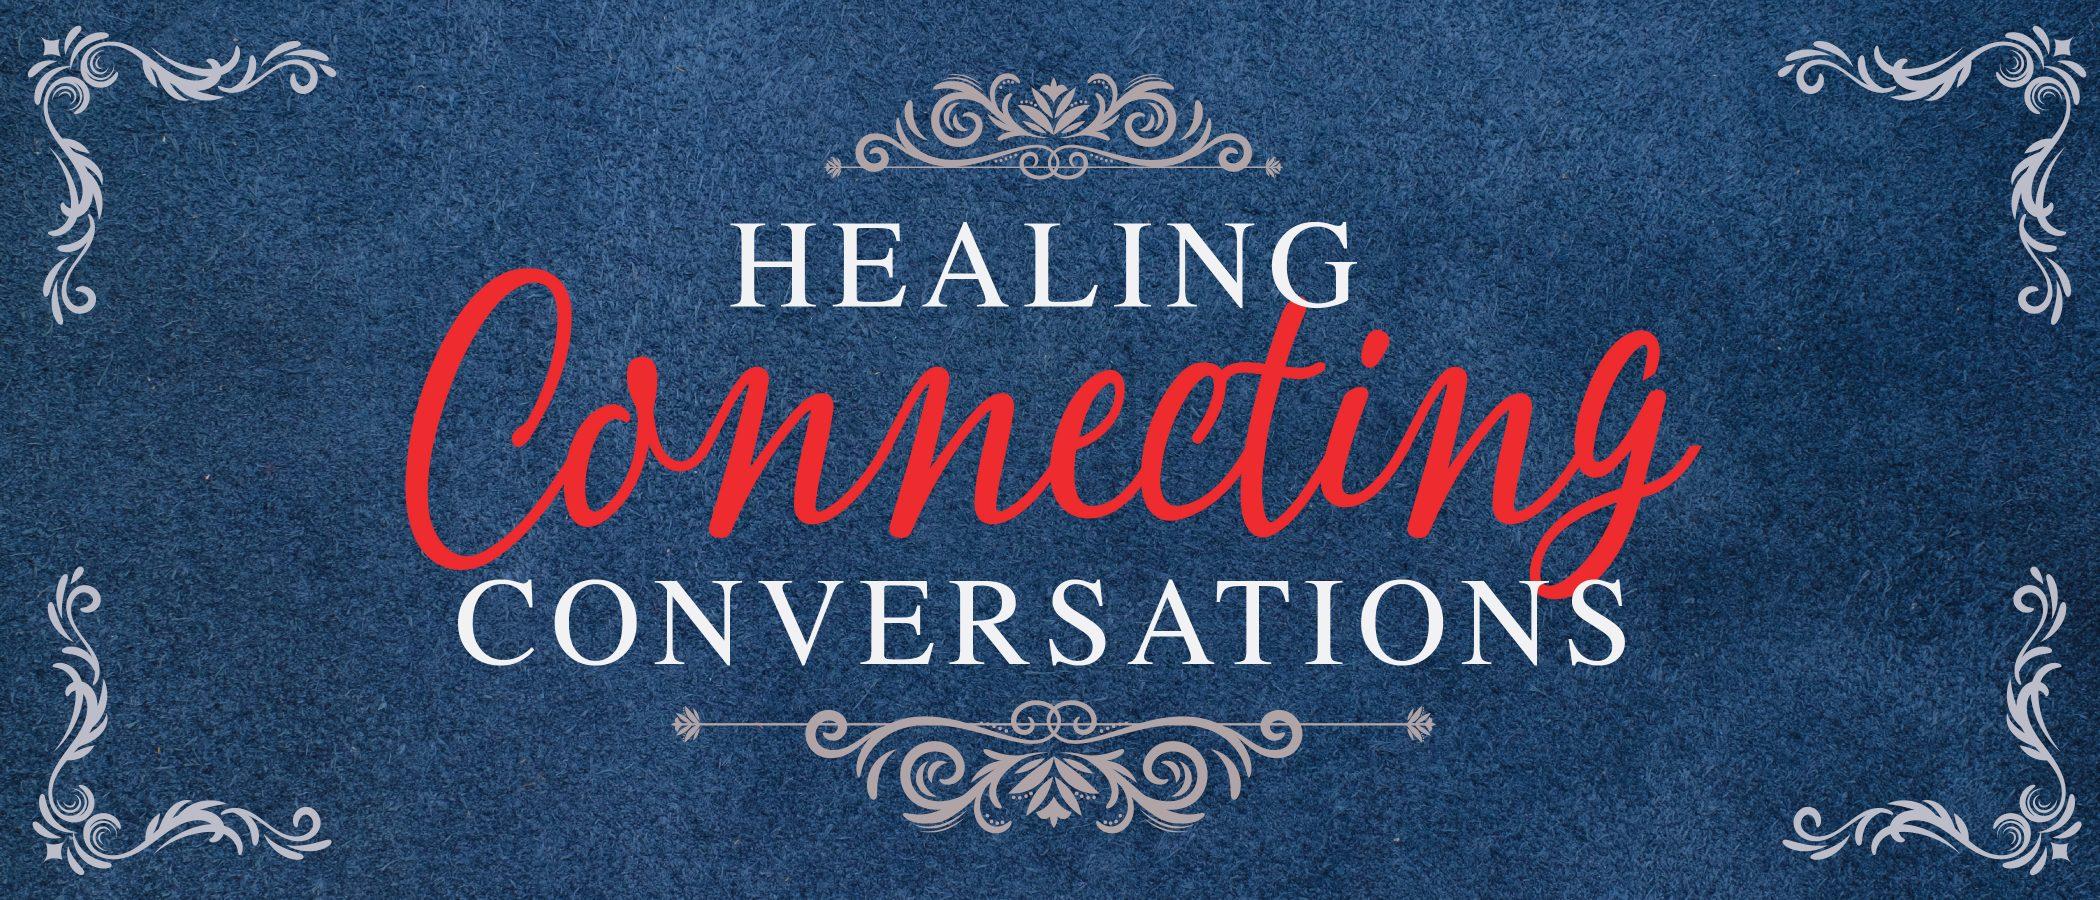 healing-connecting-conversations-11brd-dq2021-web-banner-video2x-100